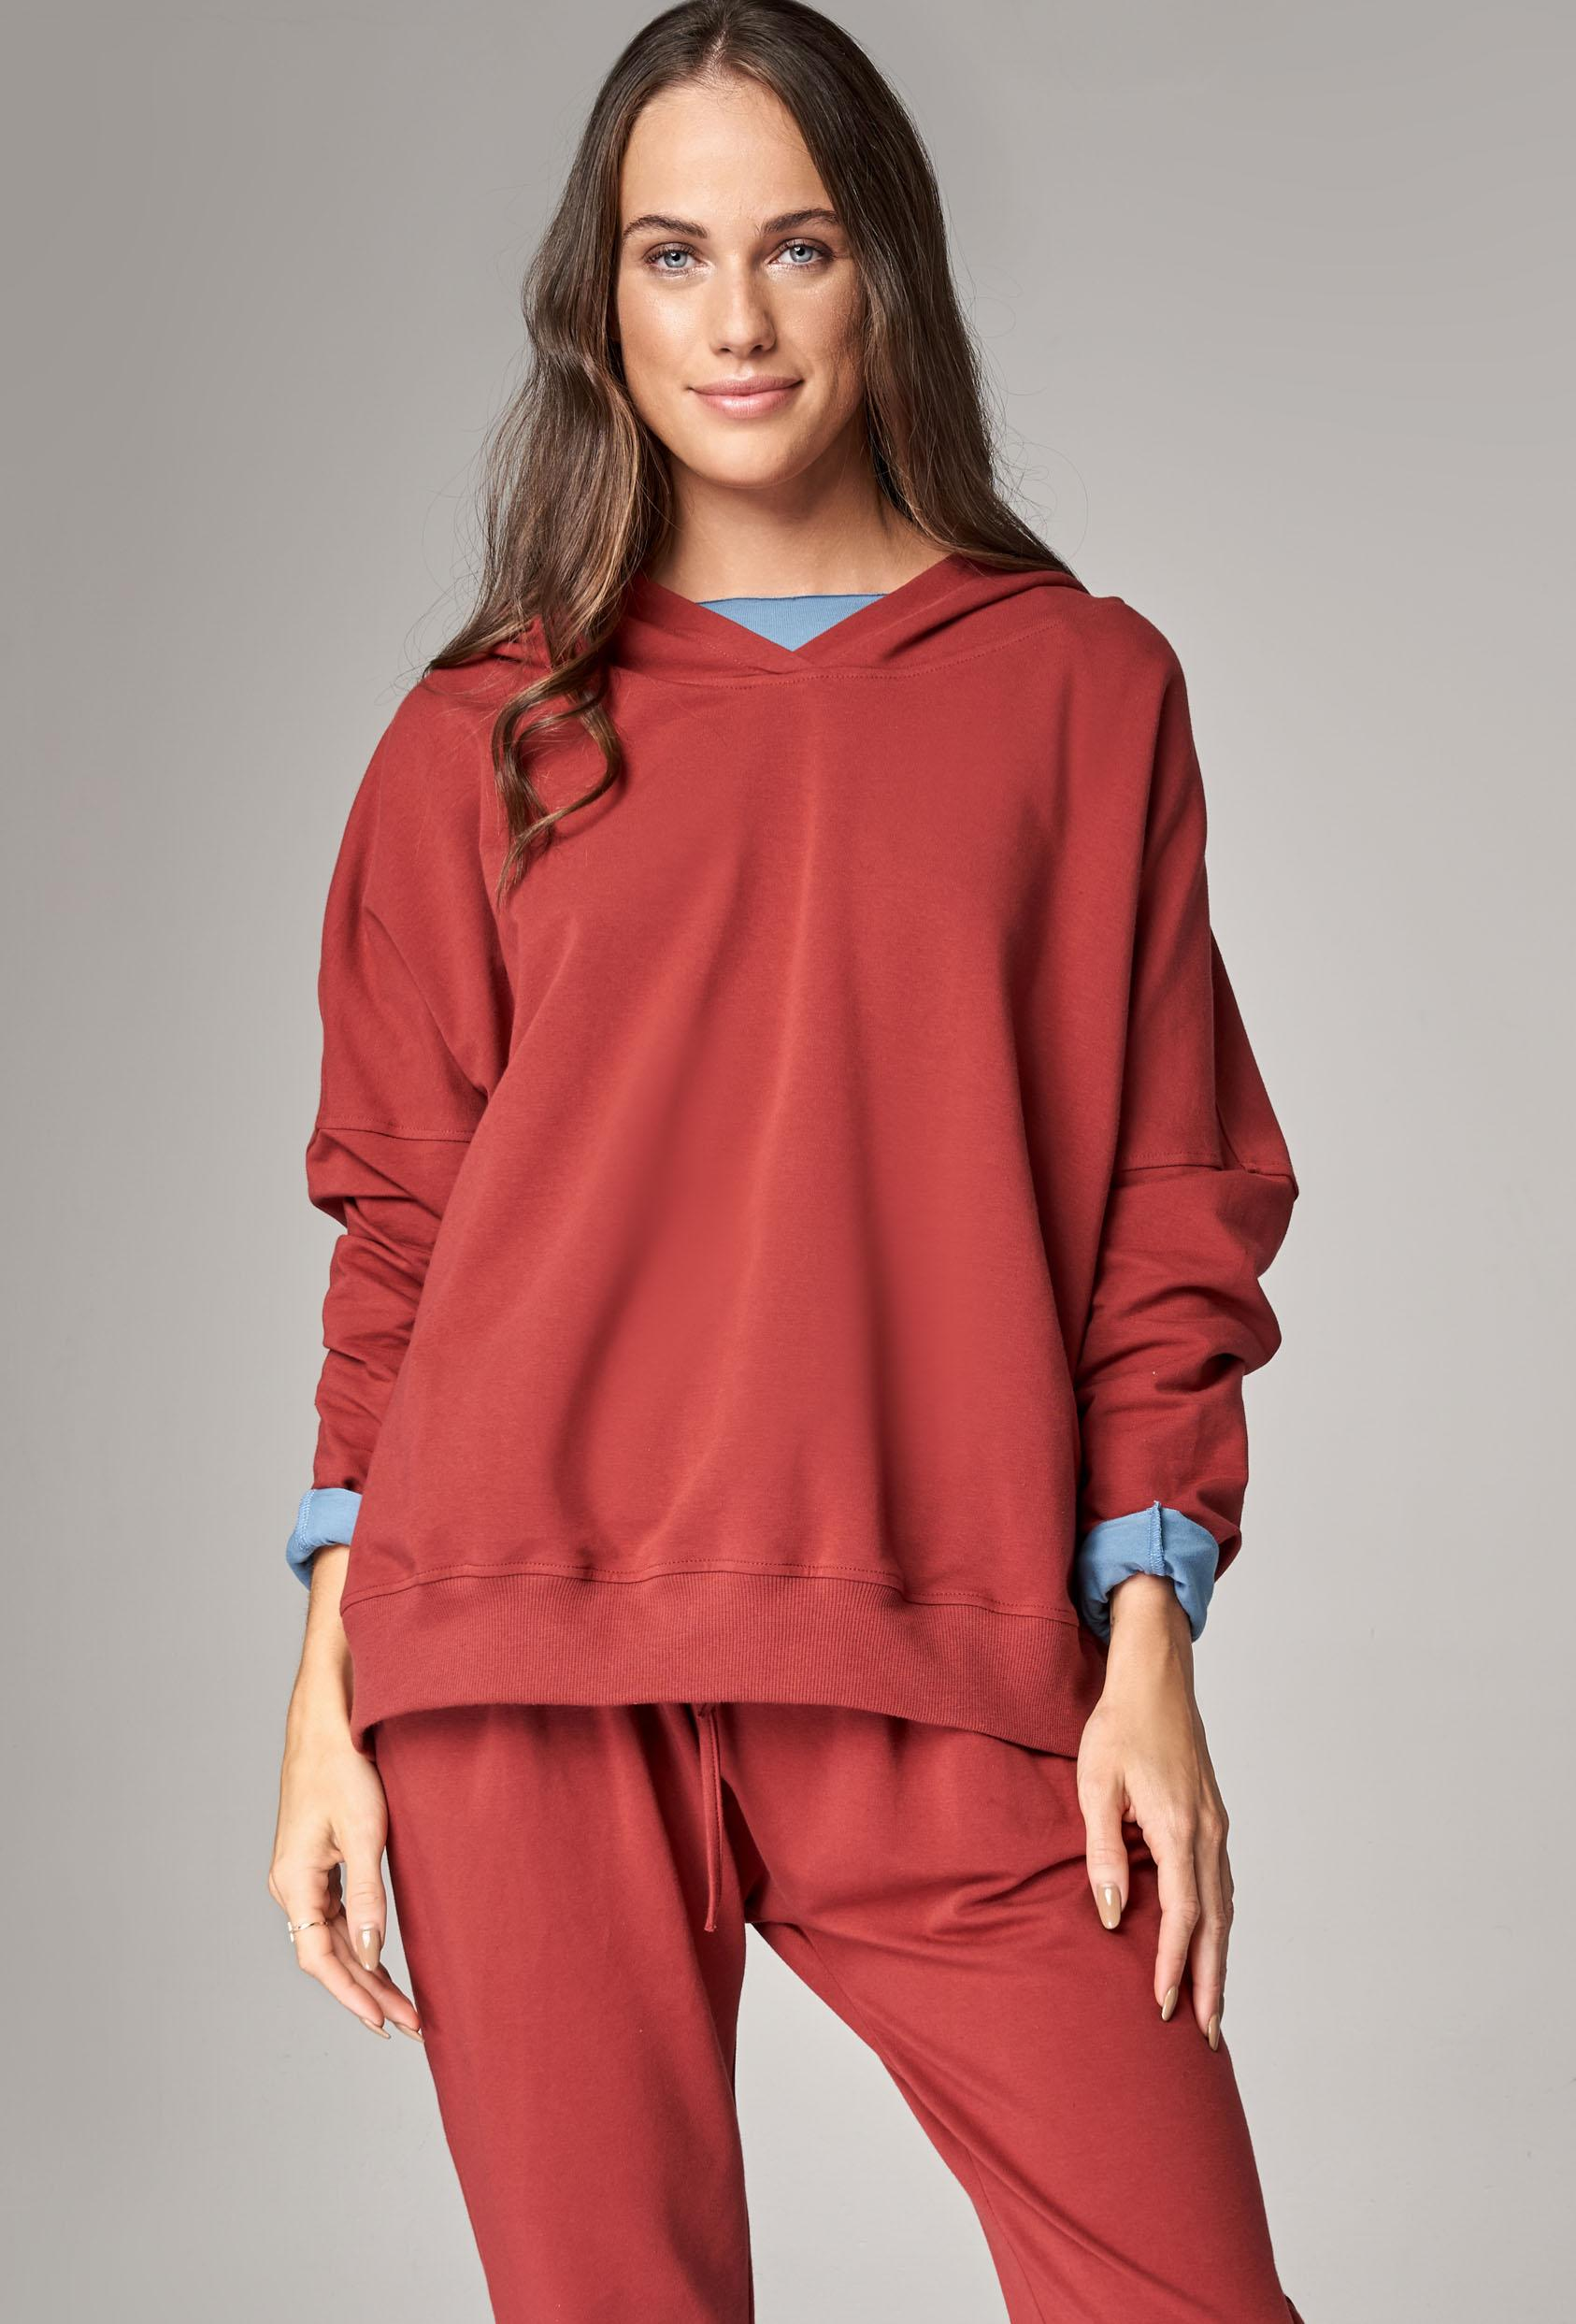 Bluza z kapturem EDEN JUMPER czerwony